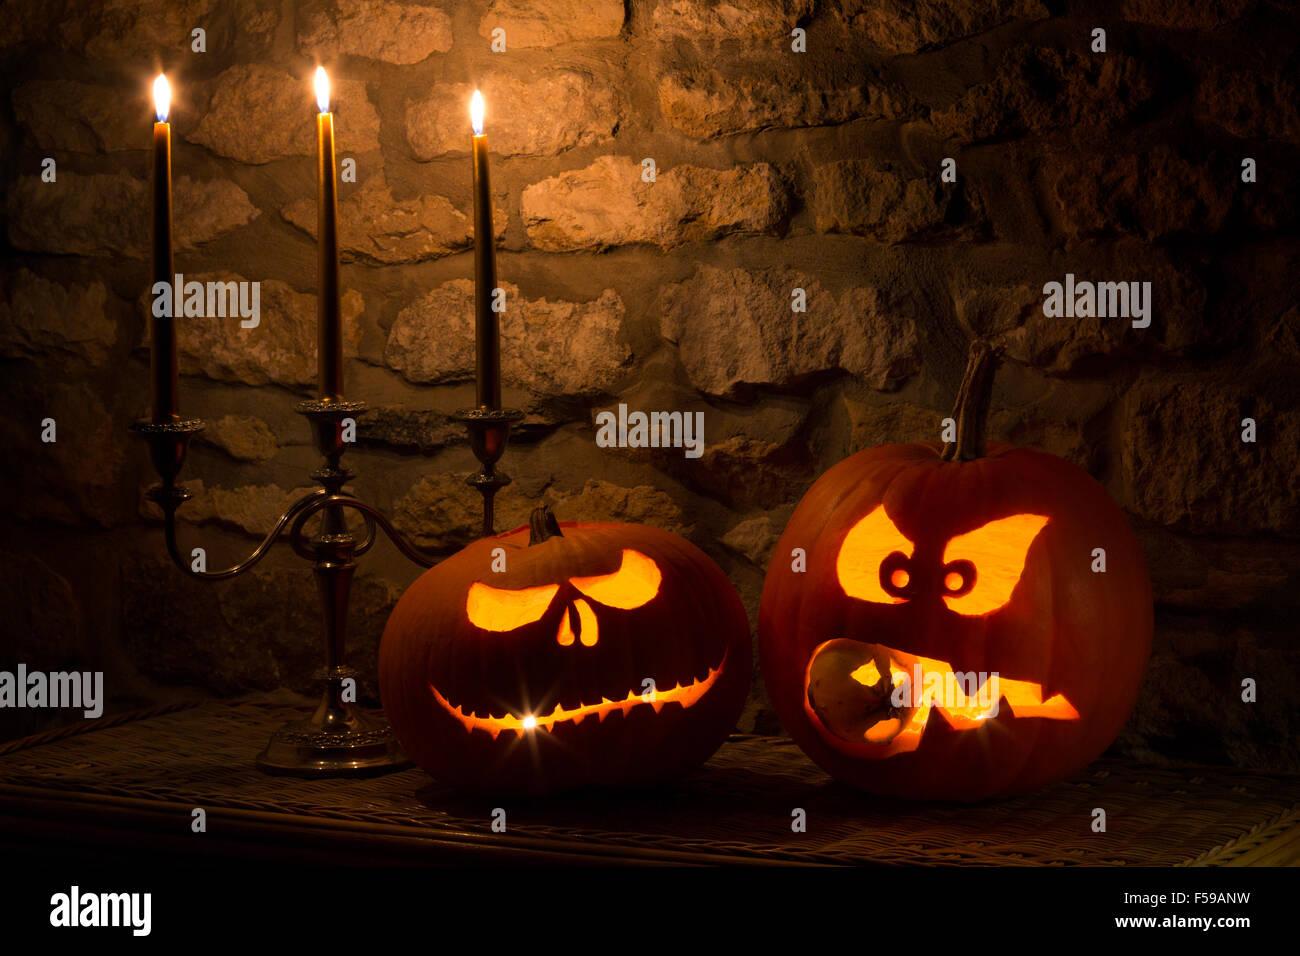 Spooky Zucche di Halloween Immagini Stock